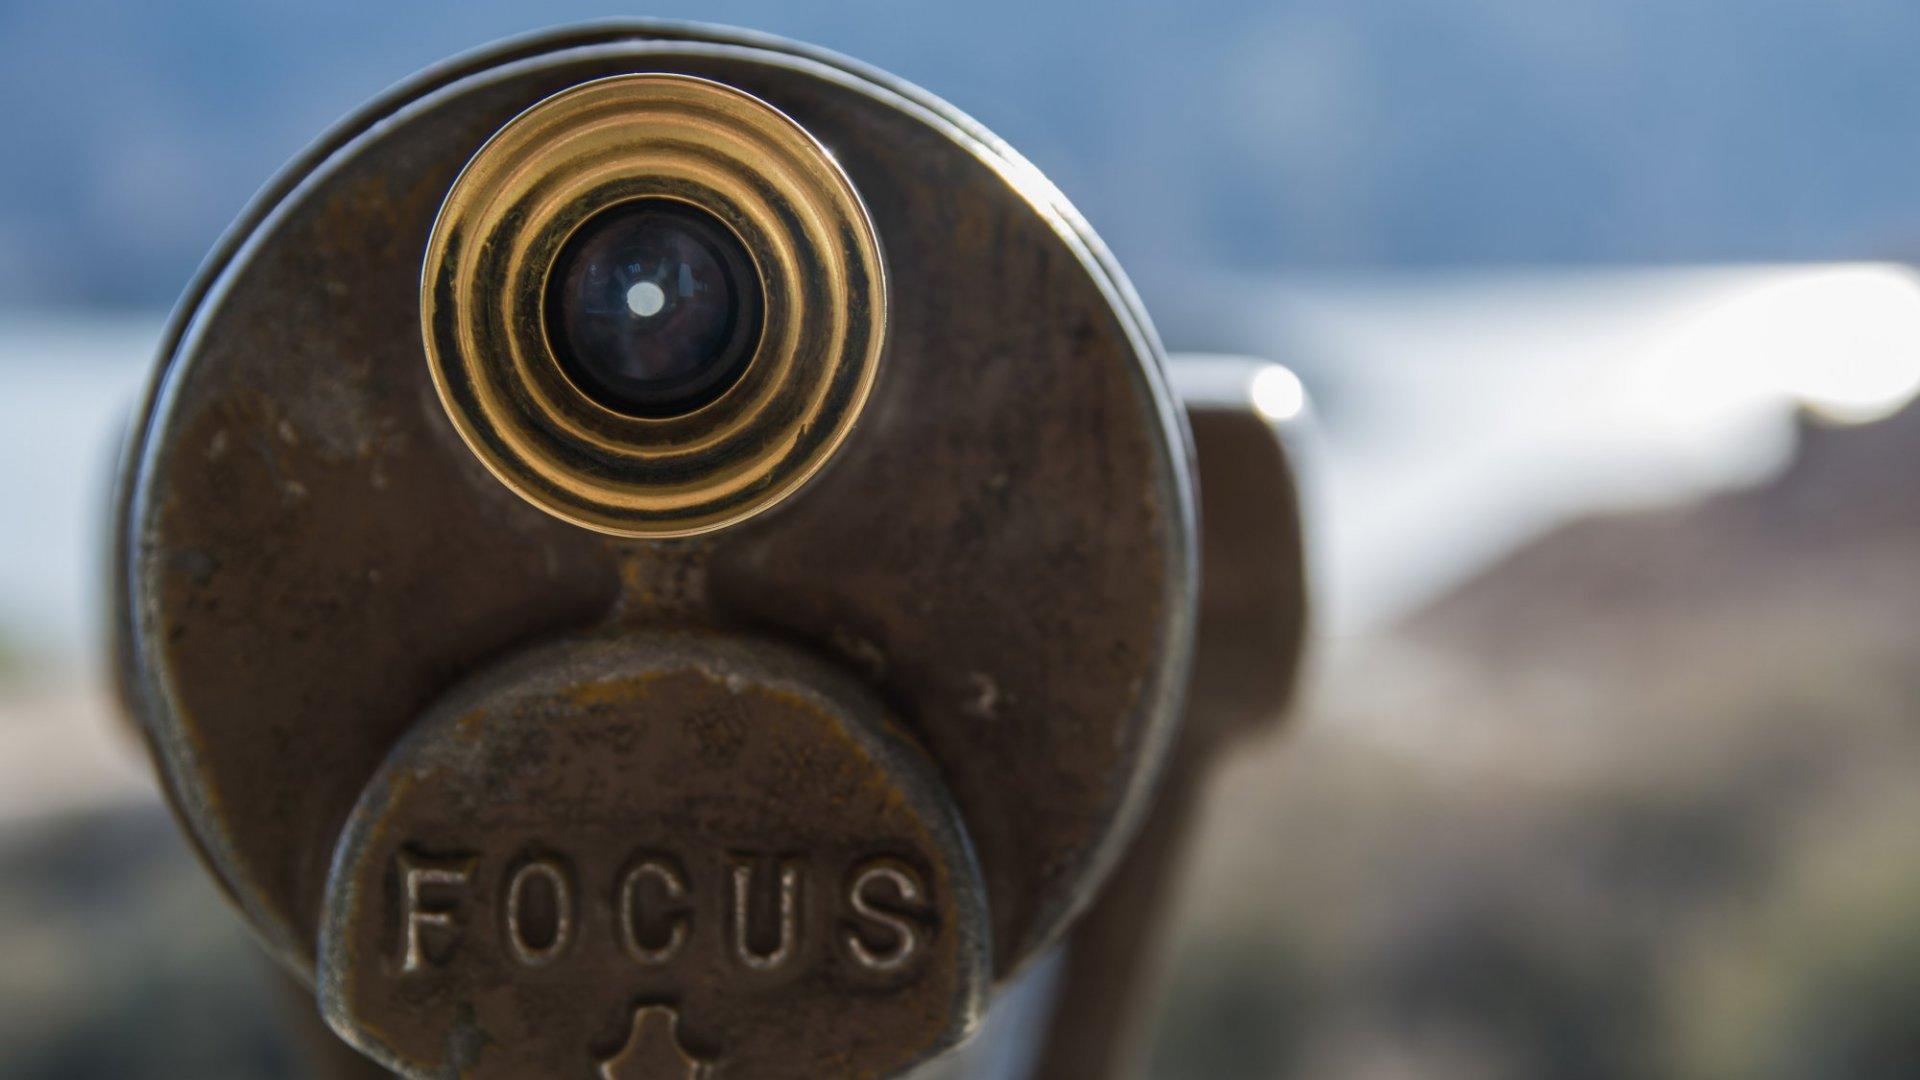 More Than Focus